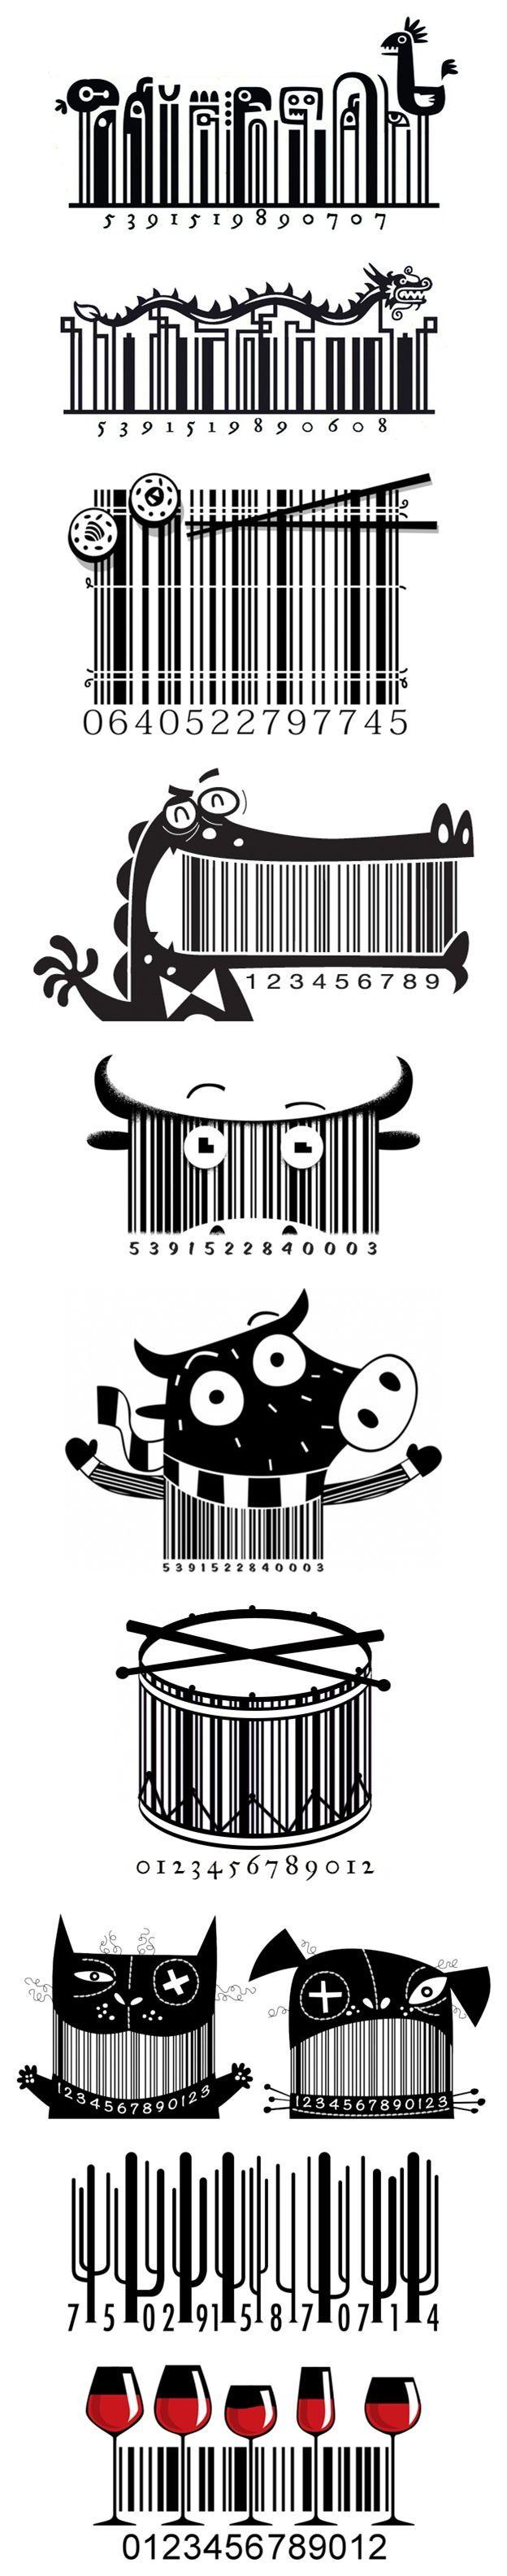 Steve Simpson: Illustrated Bar Codes (UPC)